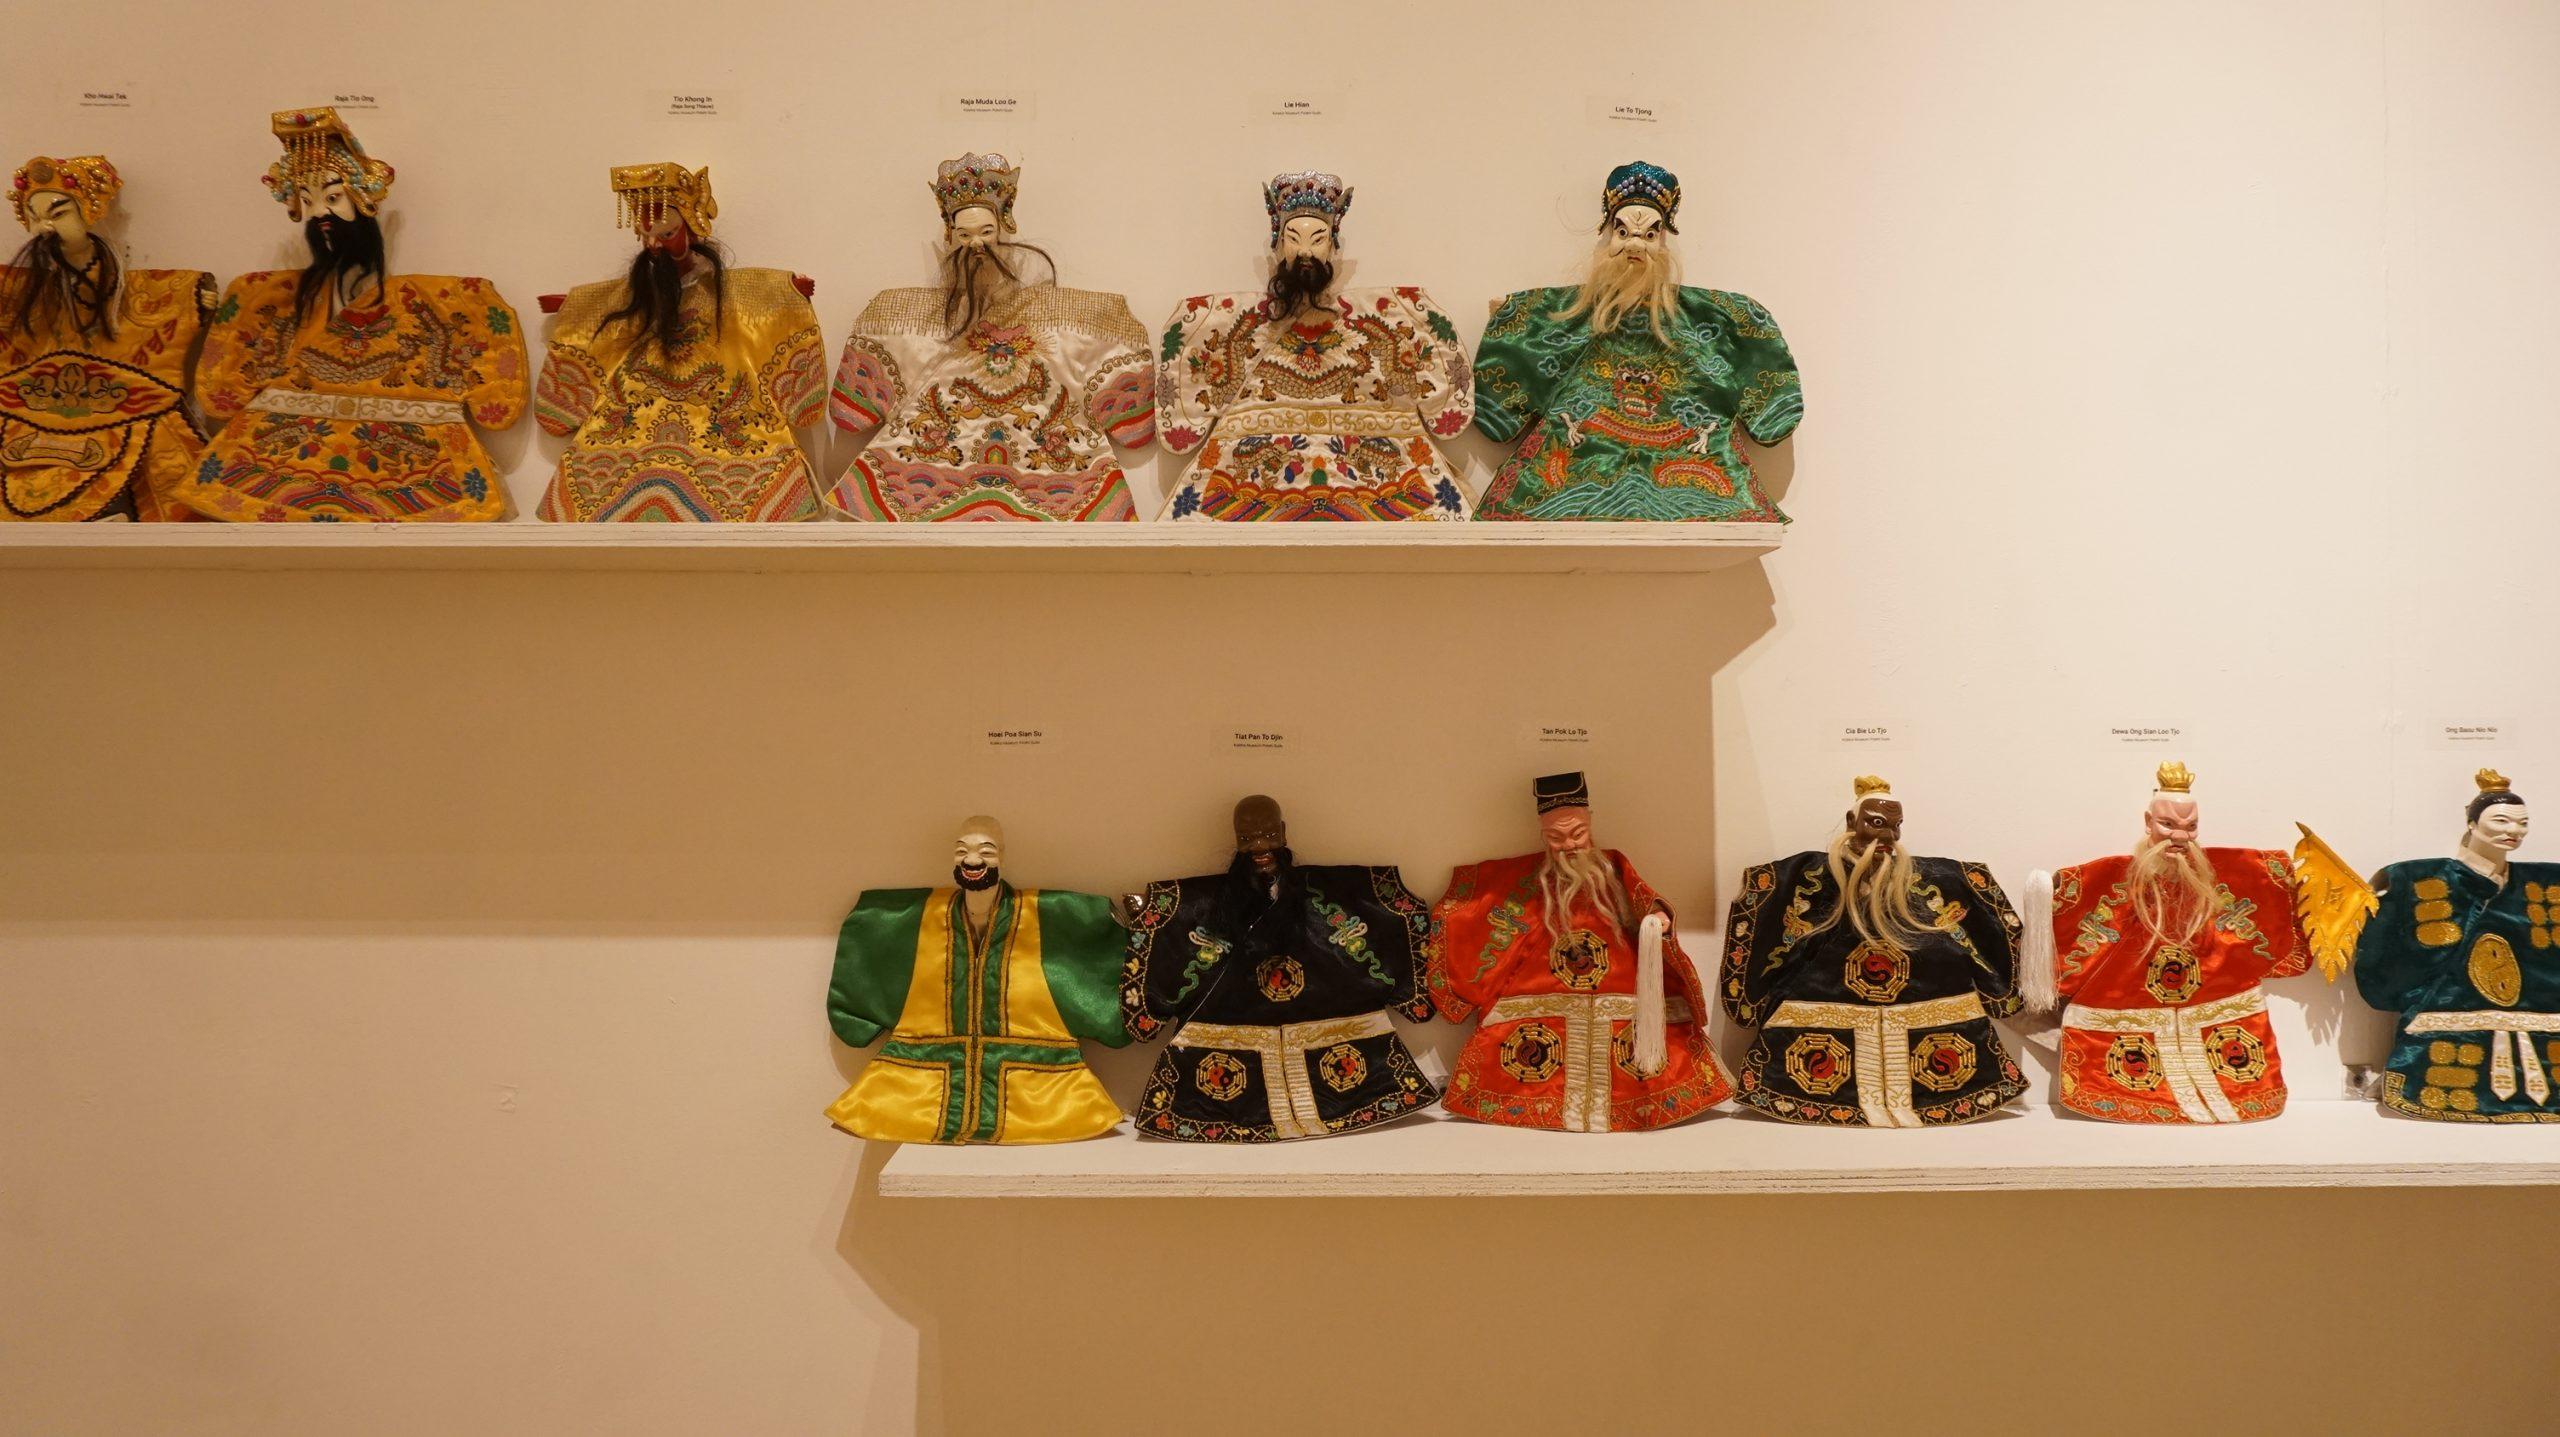 Menilik Harmoni Cina-Jawa dalam Seni Pertunjukkan di Museum Sonobudoyo Yogyakarta